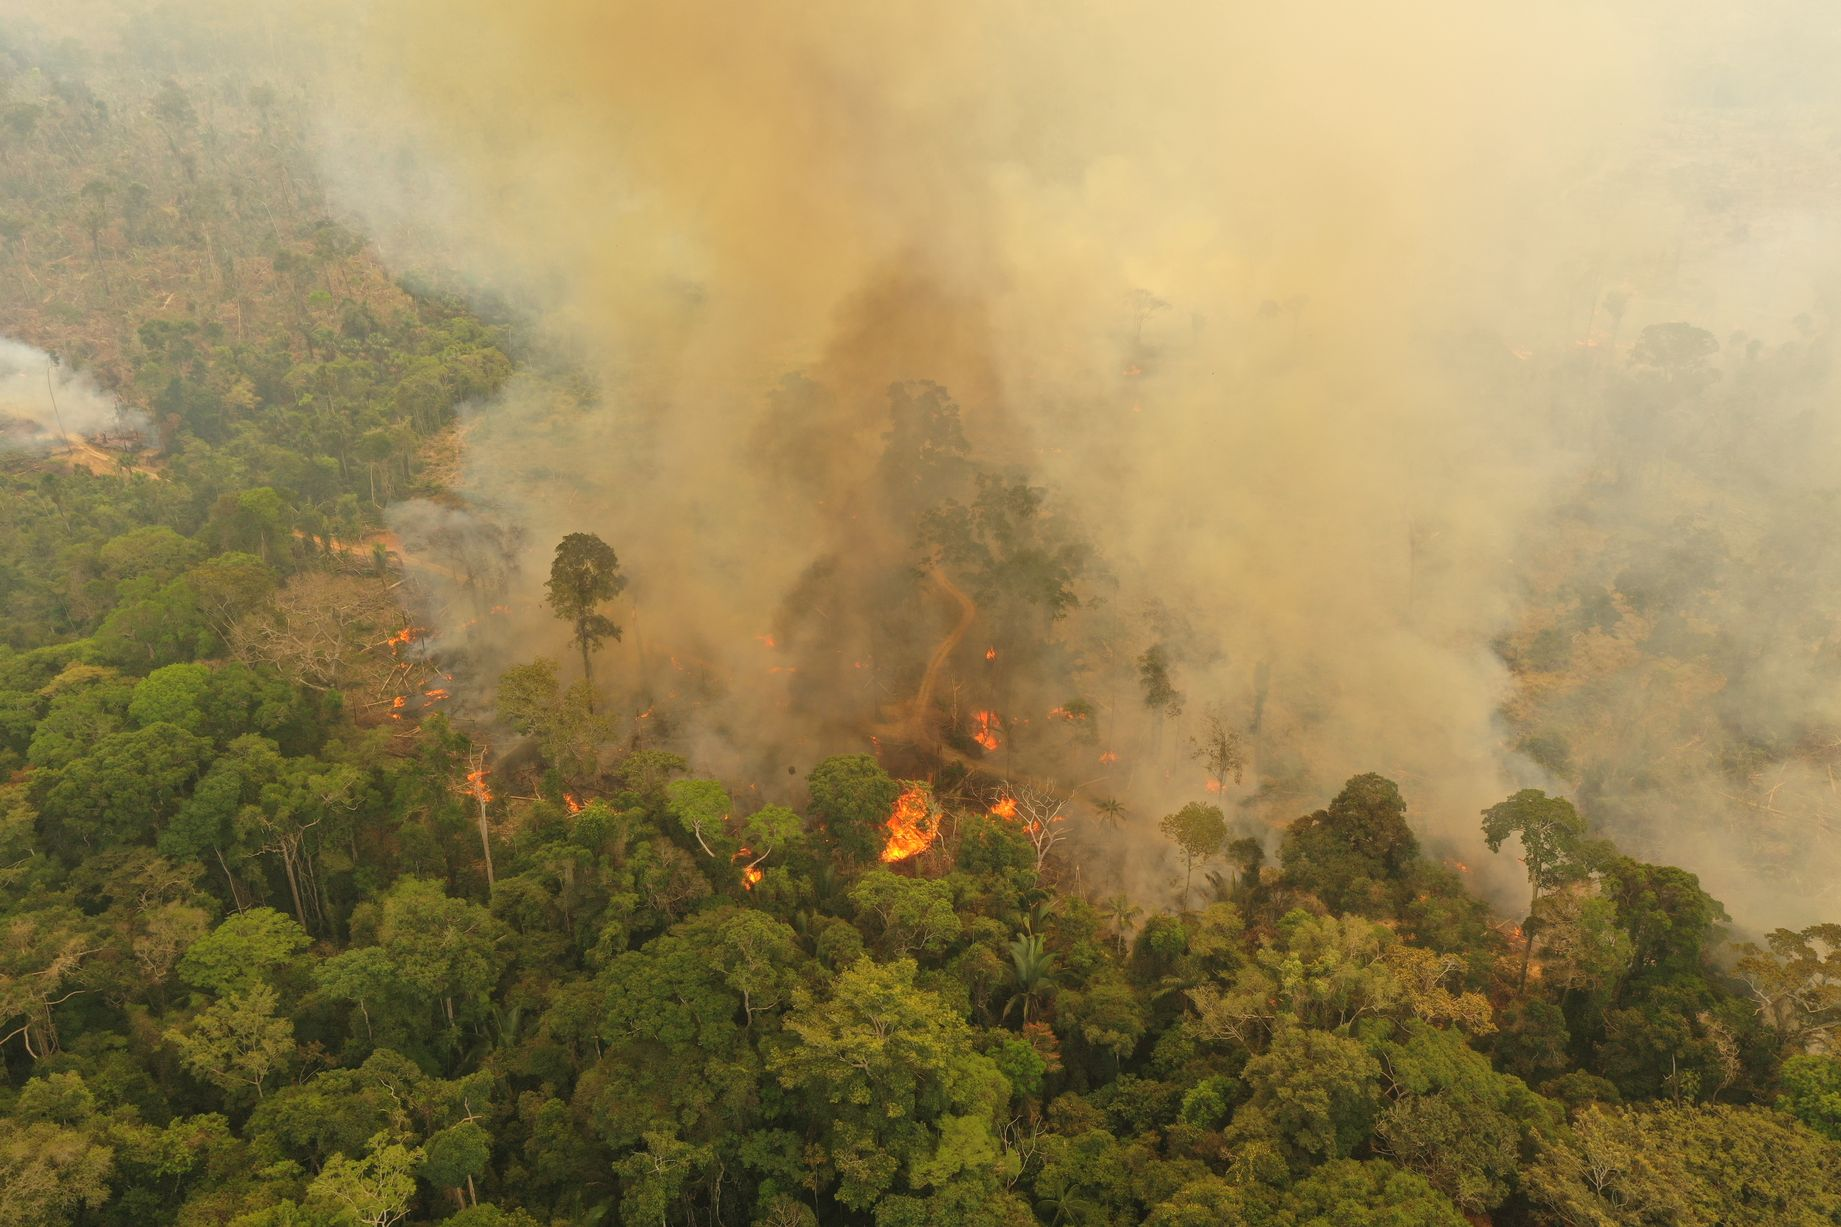 Leonardo DiCaprio's Earth Alliance Pledged To Donate $5 Million For Amazon Rainforest